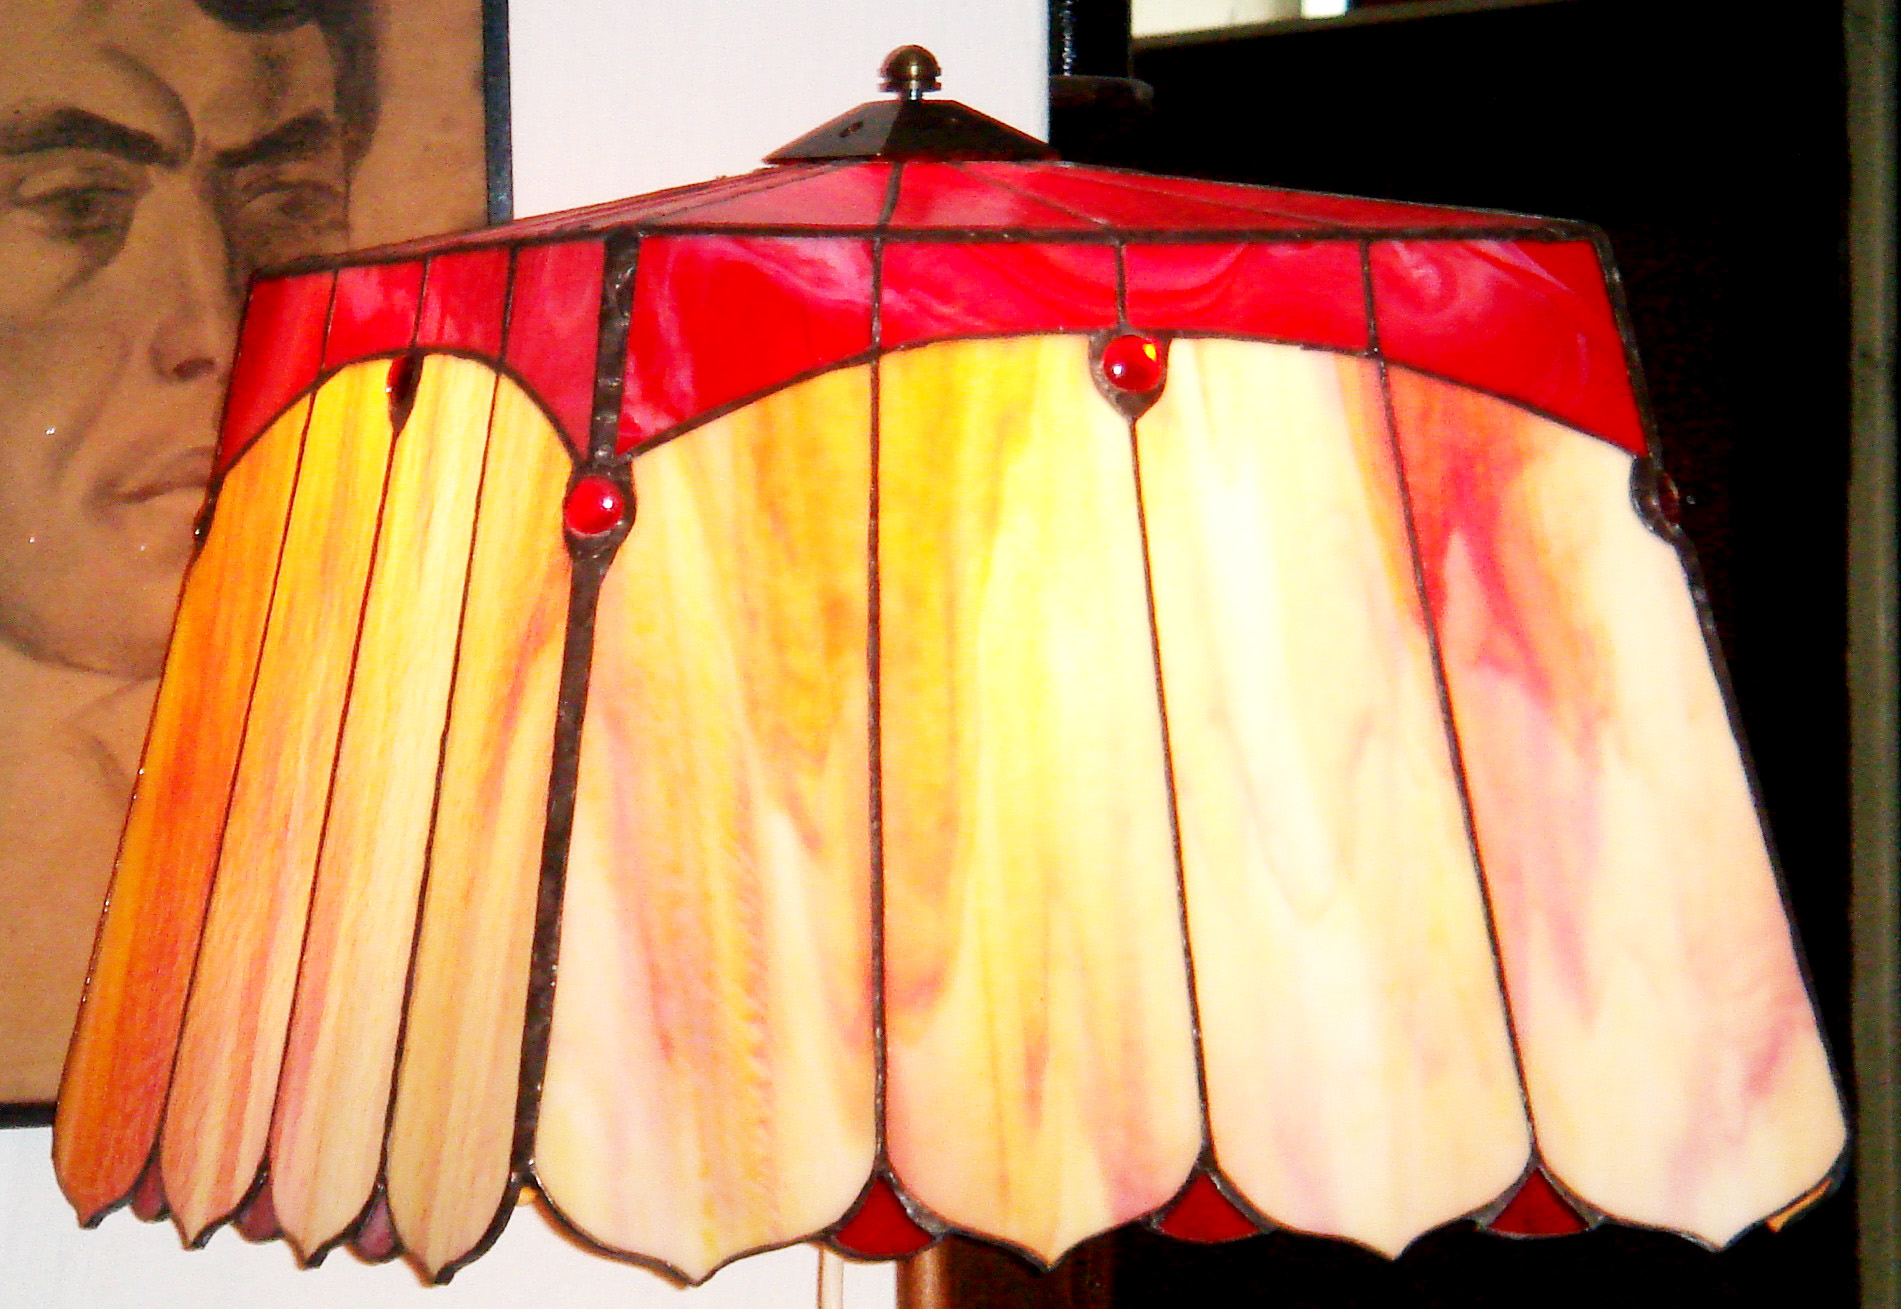 Tiffany-allolampa-rozsaszines-buraval